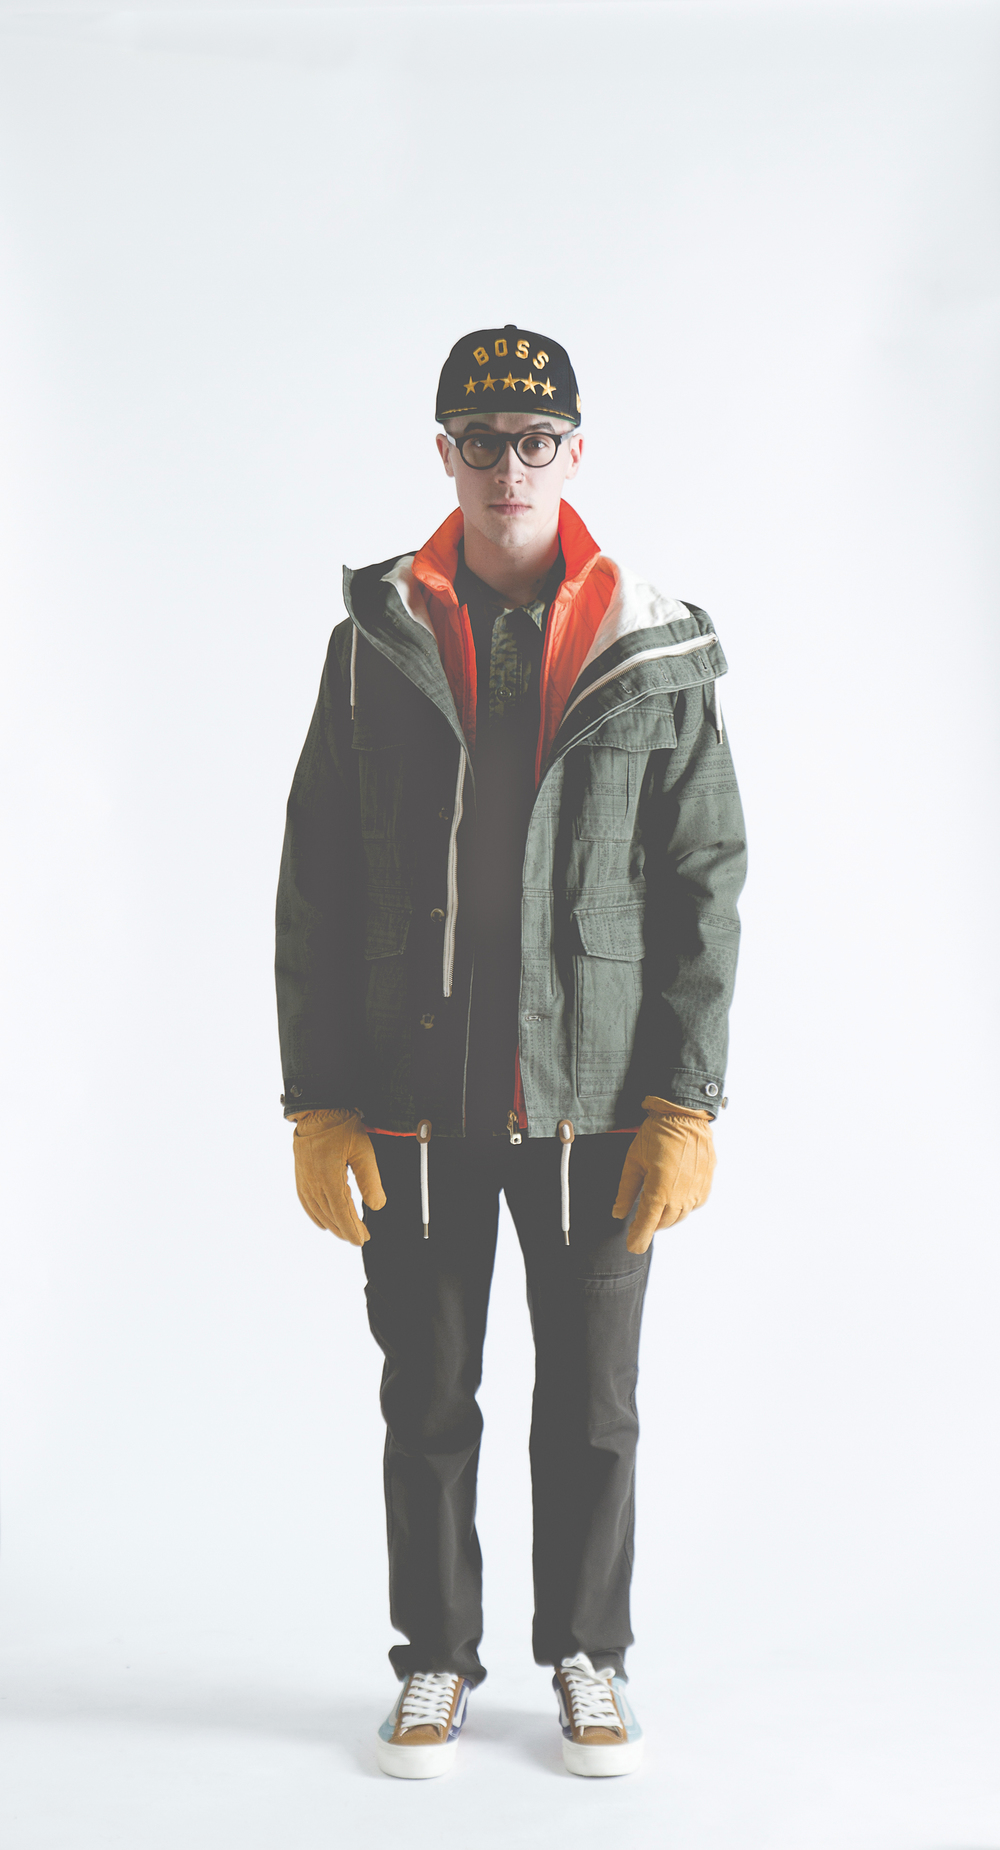 Deus - Gordon Jacket   Wesc - Reson Gloves   Baldwin - Cash Work pants